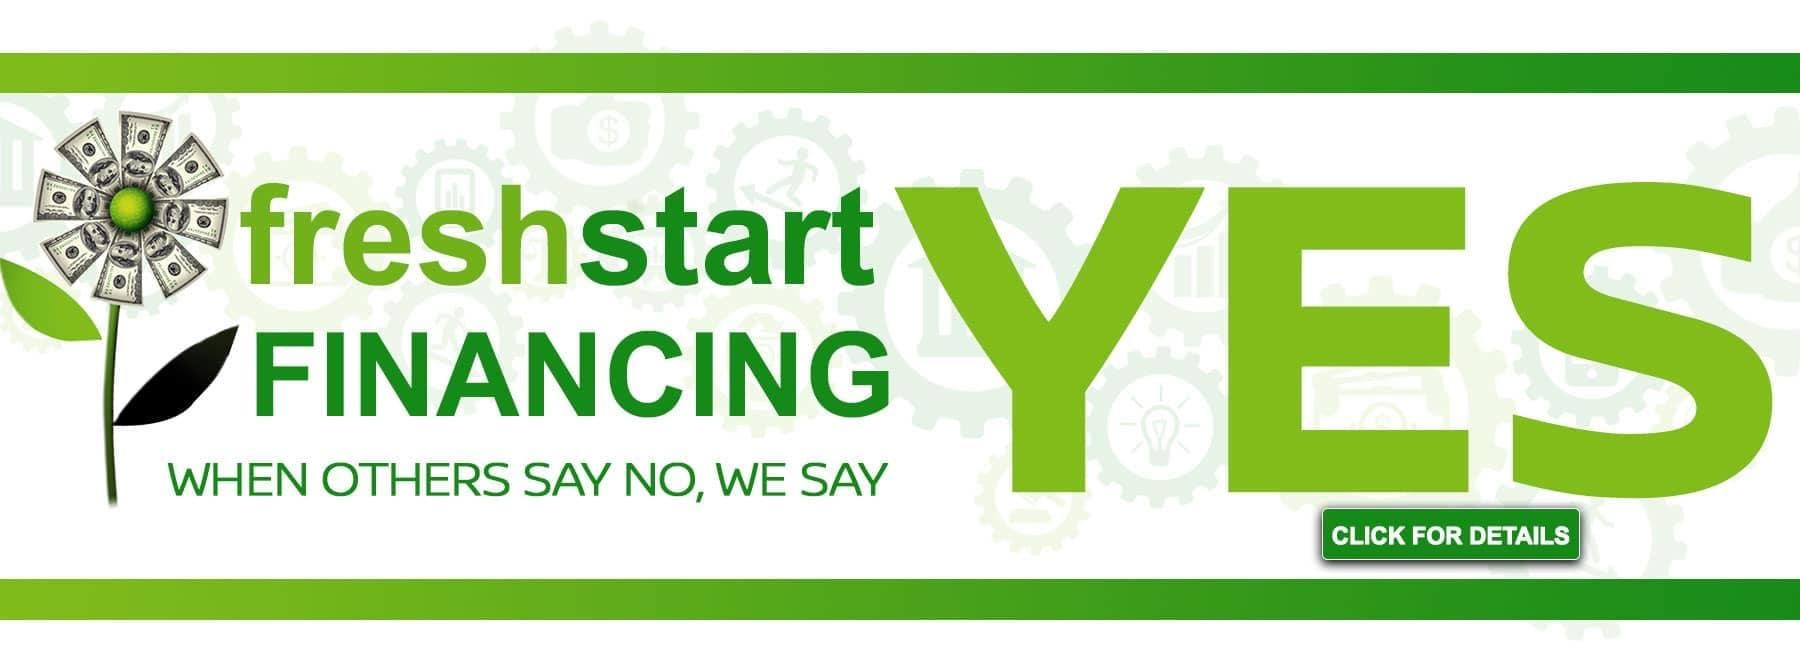 Fresh Start Financing